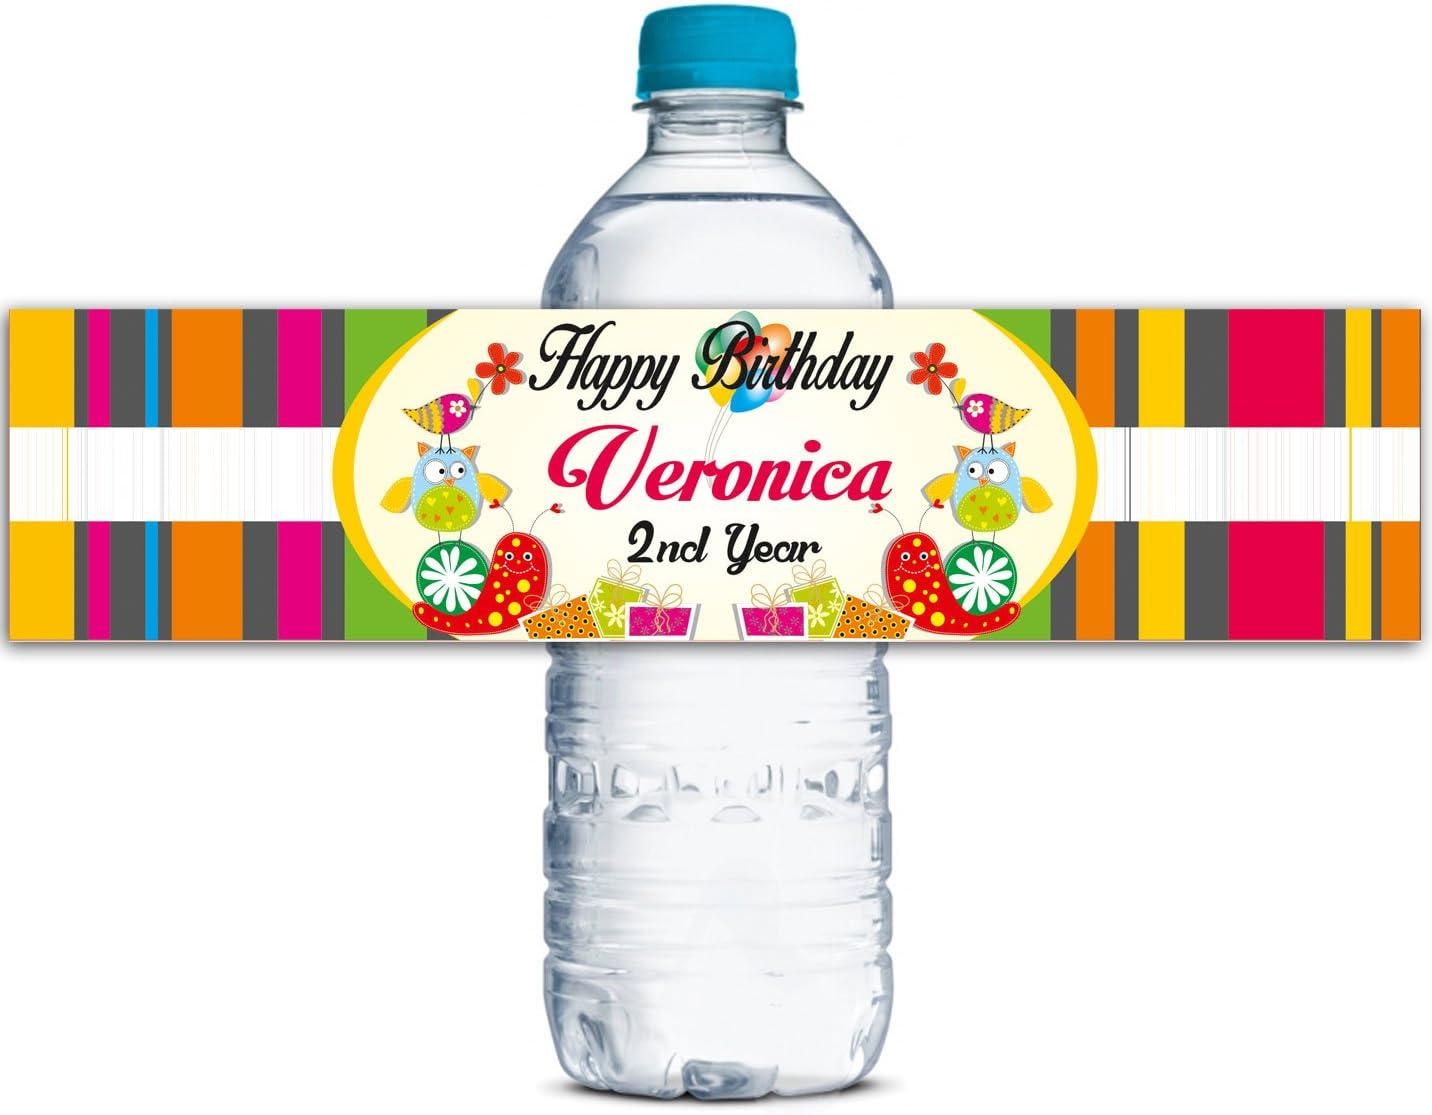 Waterproof Water Bottle Labels Personalized Labels Custom Water Bottle Labels Kids Birthday Party Labels Self Adhesive Labels WBL116P